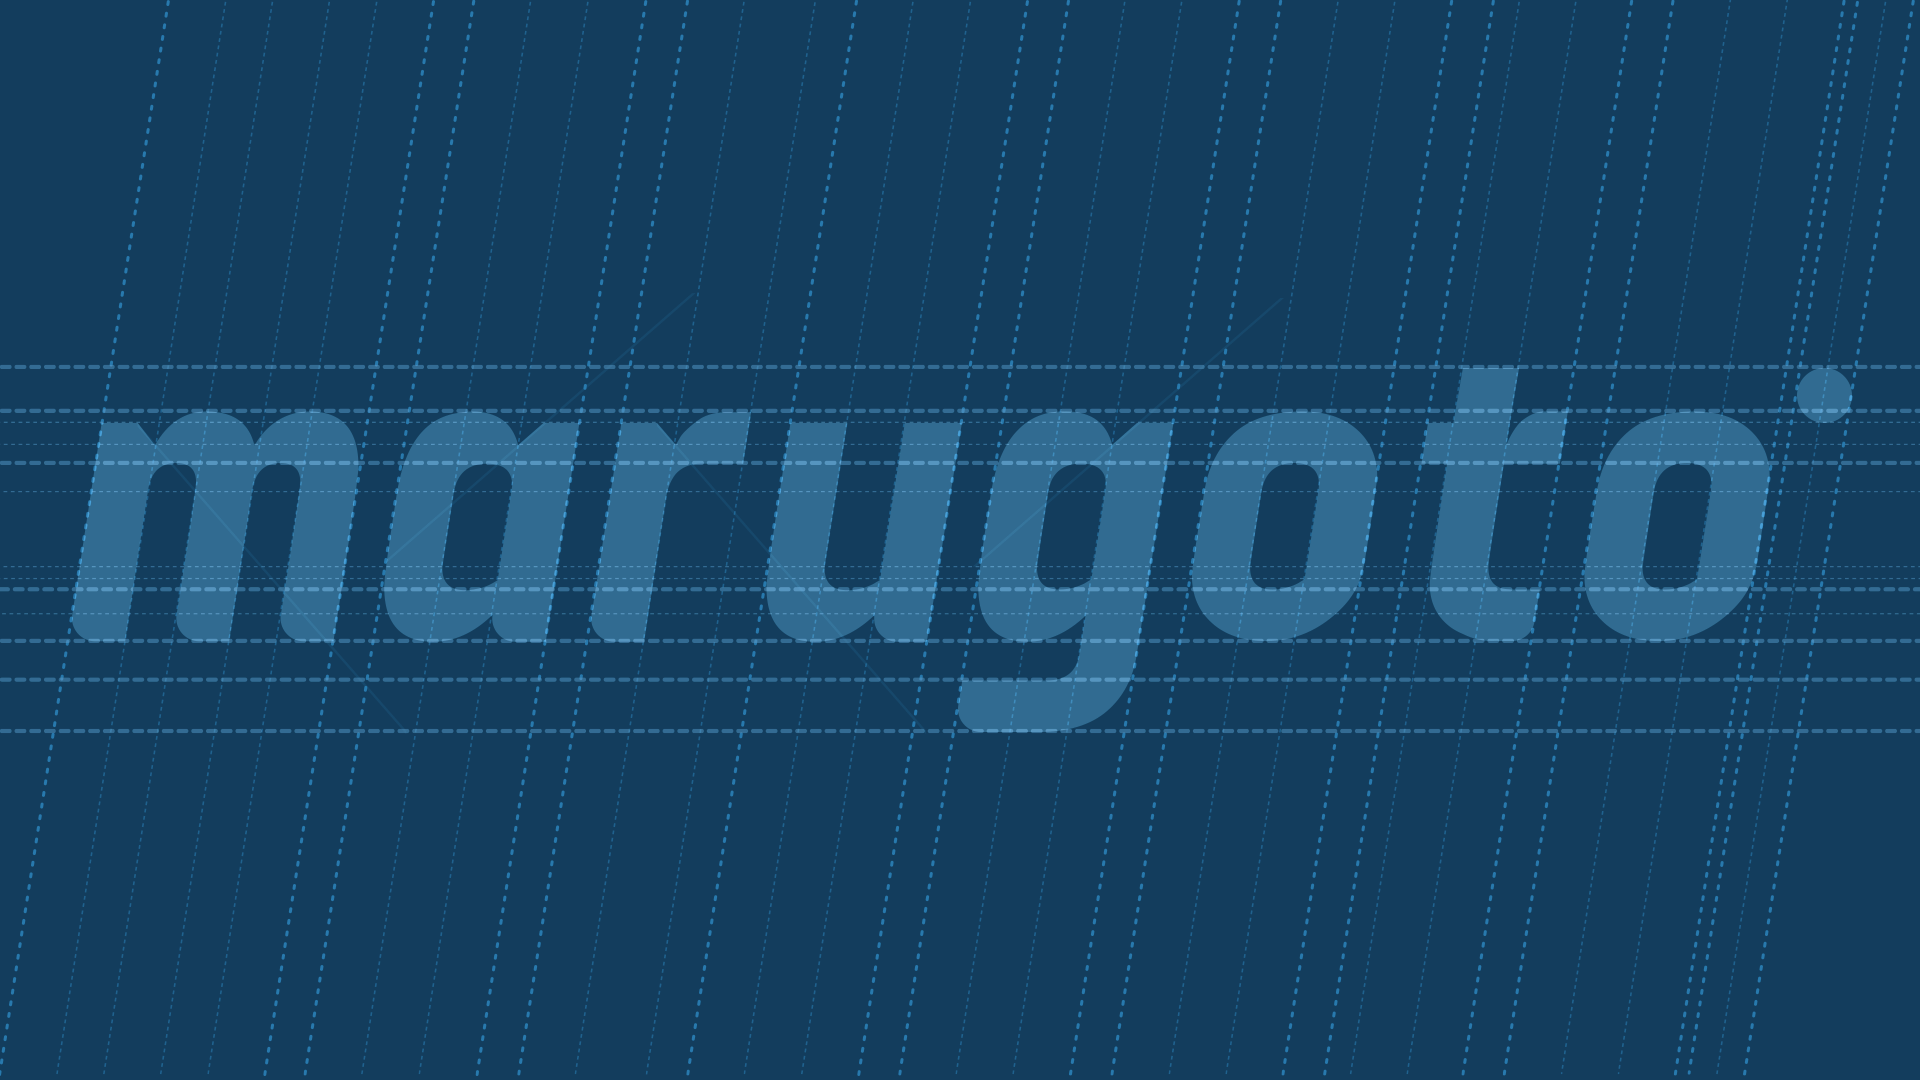 Marugoto grid